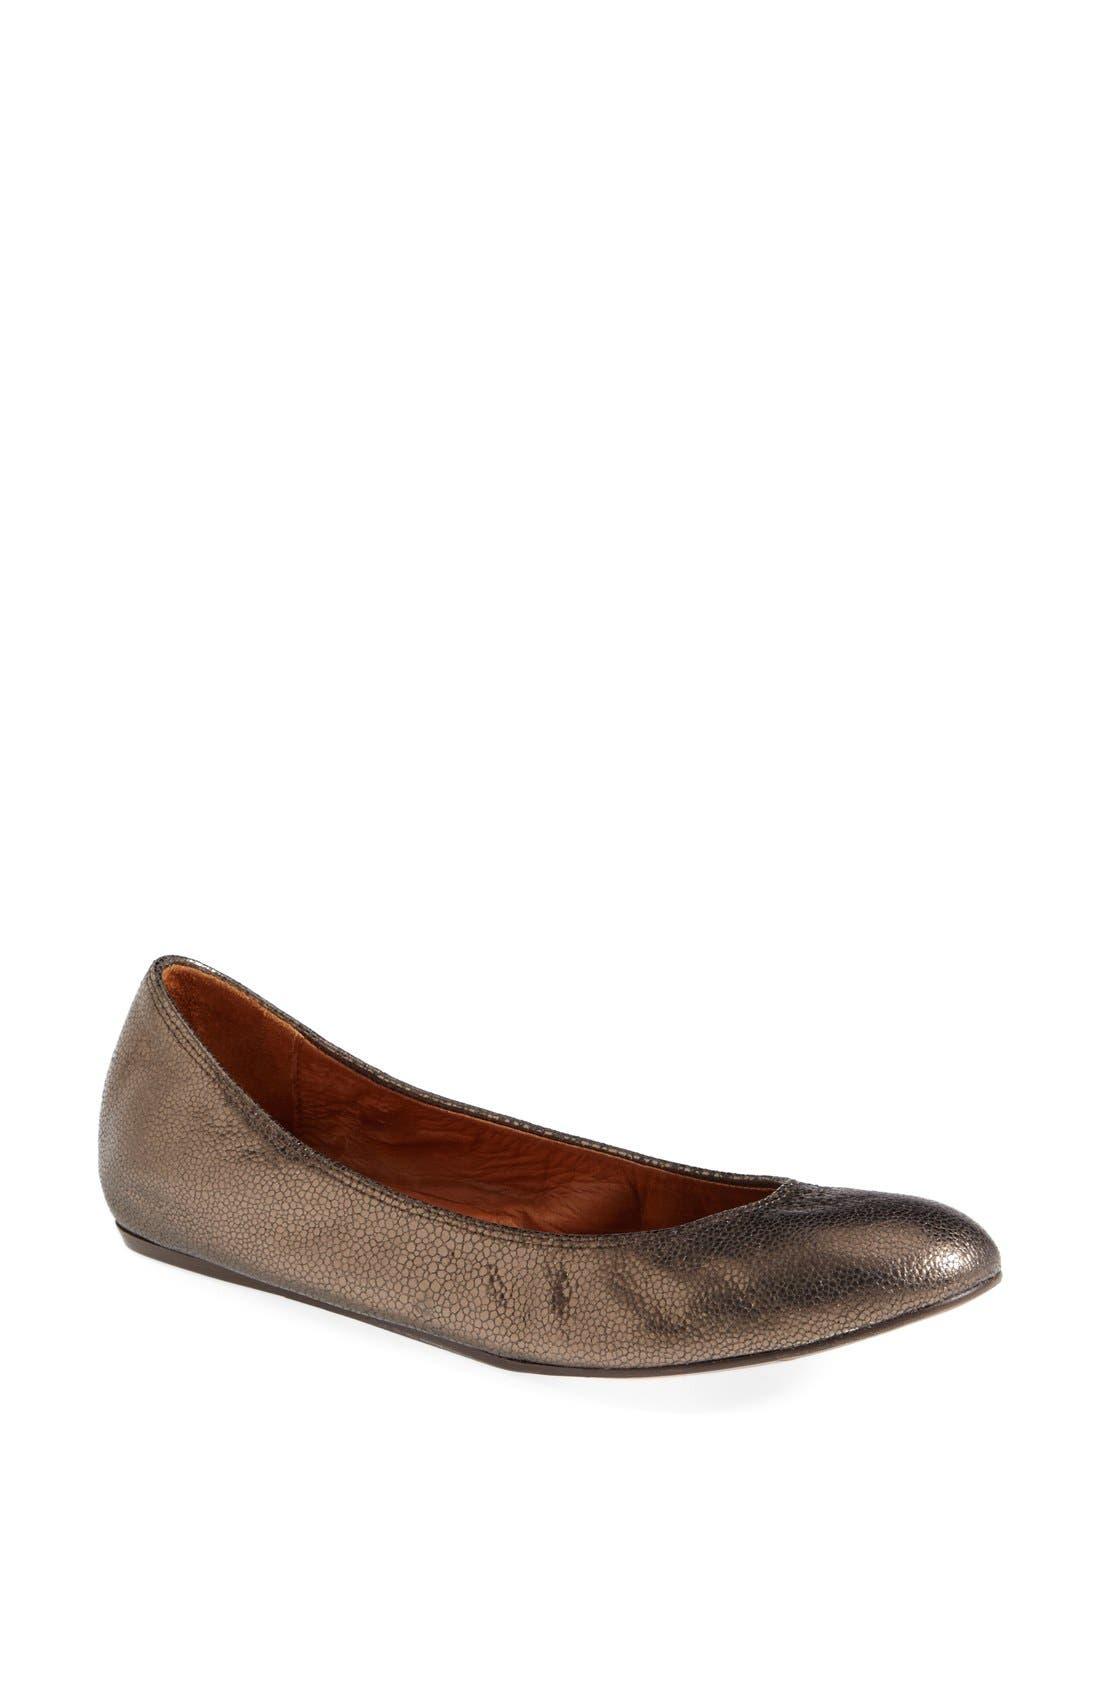 Alternate Image 1 Selected - Lanvin Metallic Leather Ballerina Flat (Women)